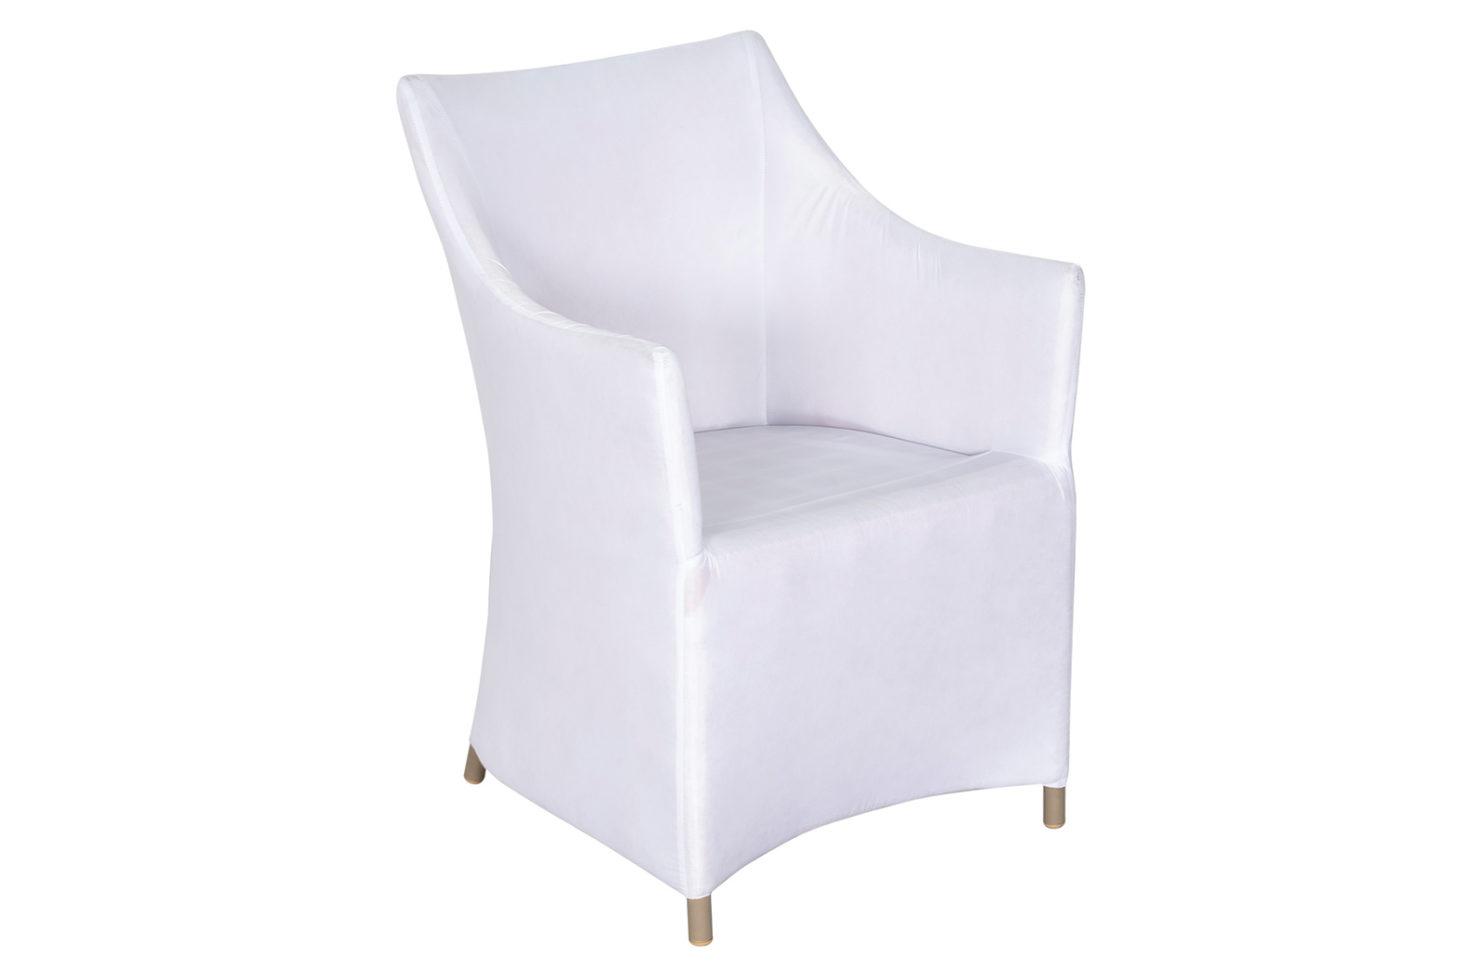 capri dining frame 620FT090P2 no cushion 3Q